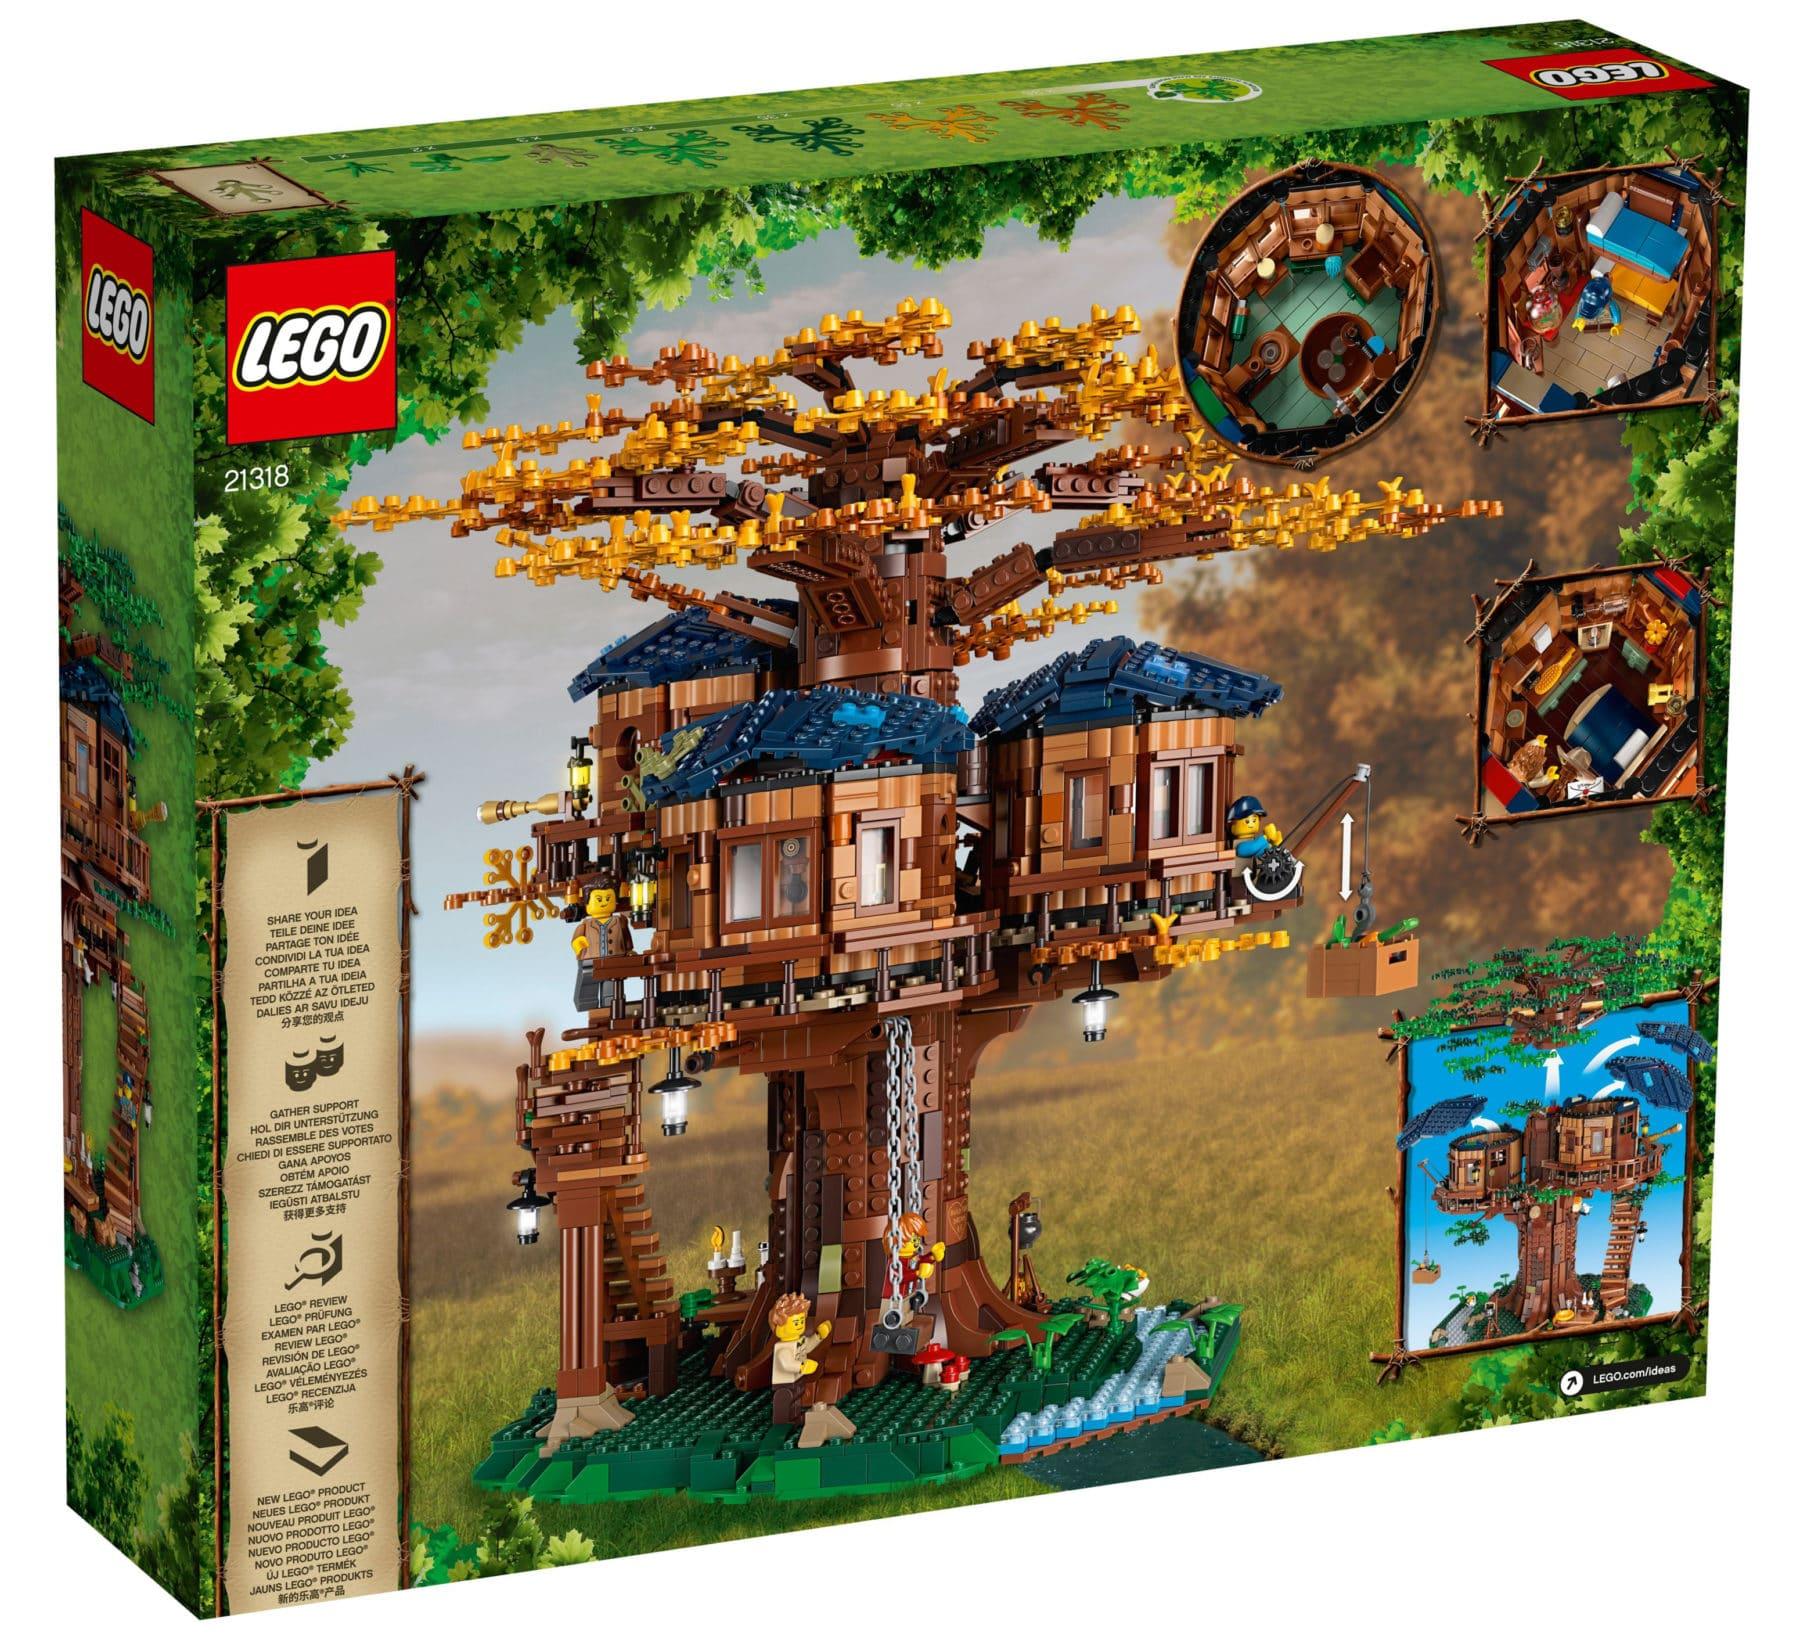 LEGO 21318 Baumhaus Box Rückseite